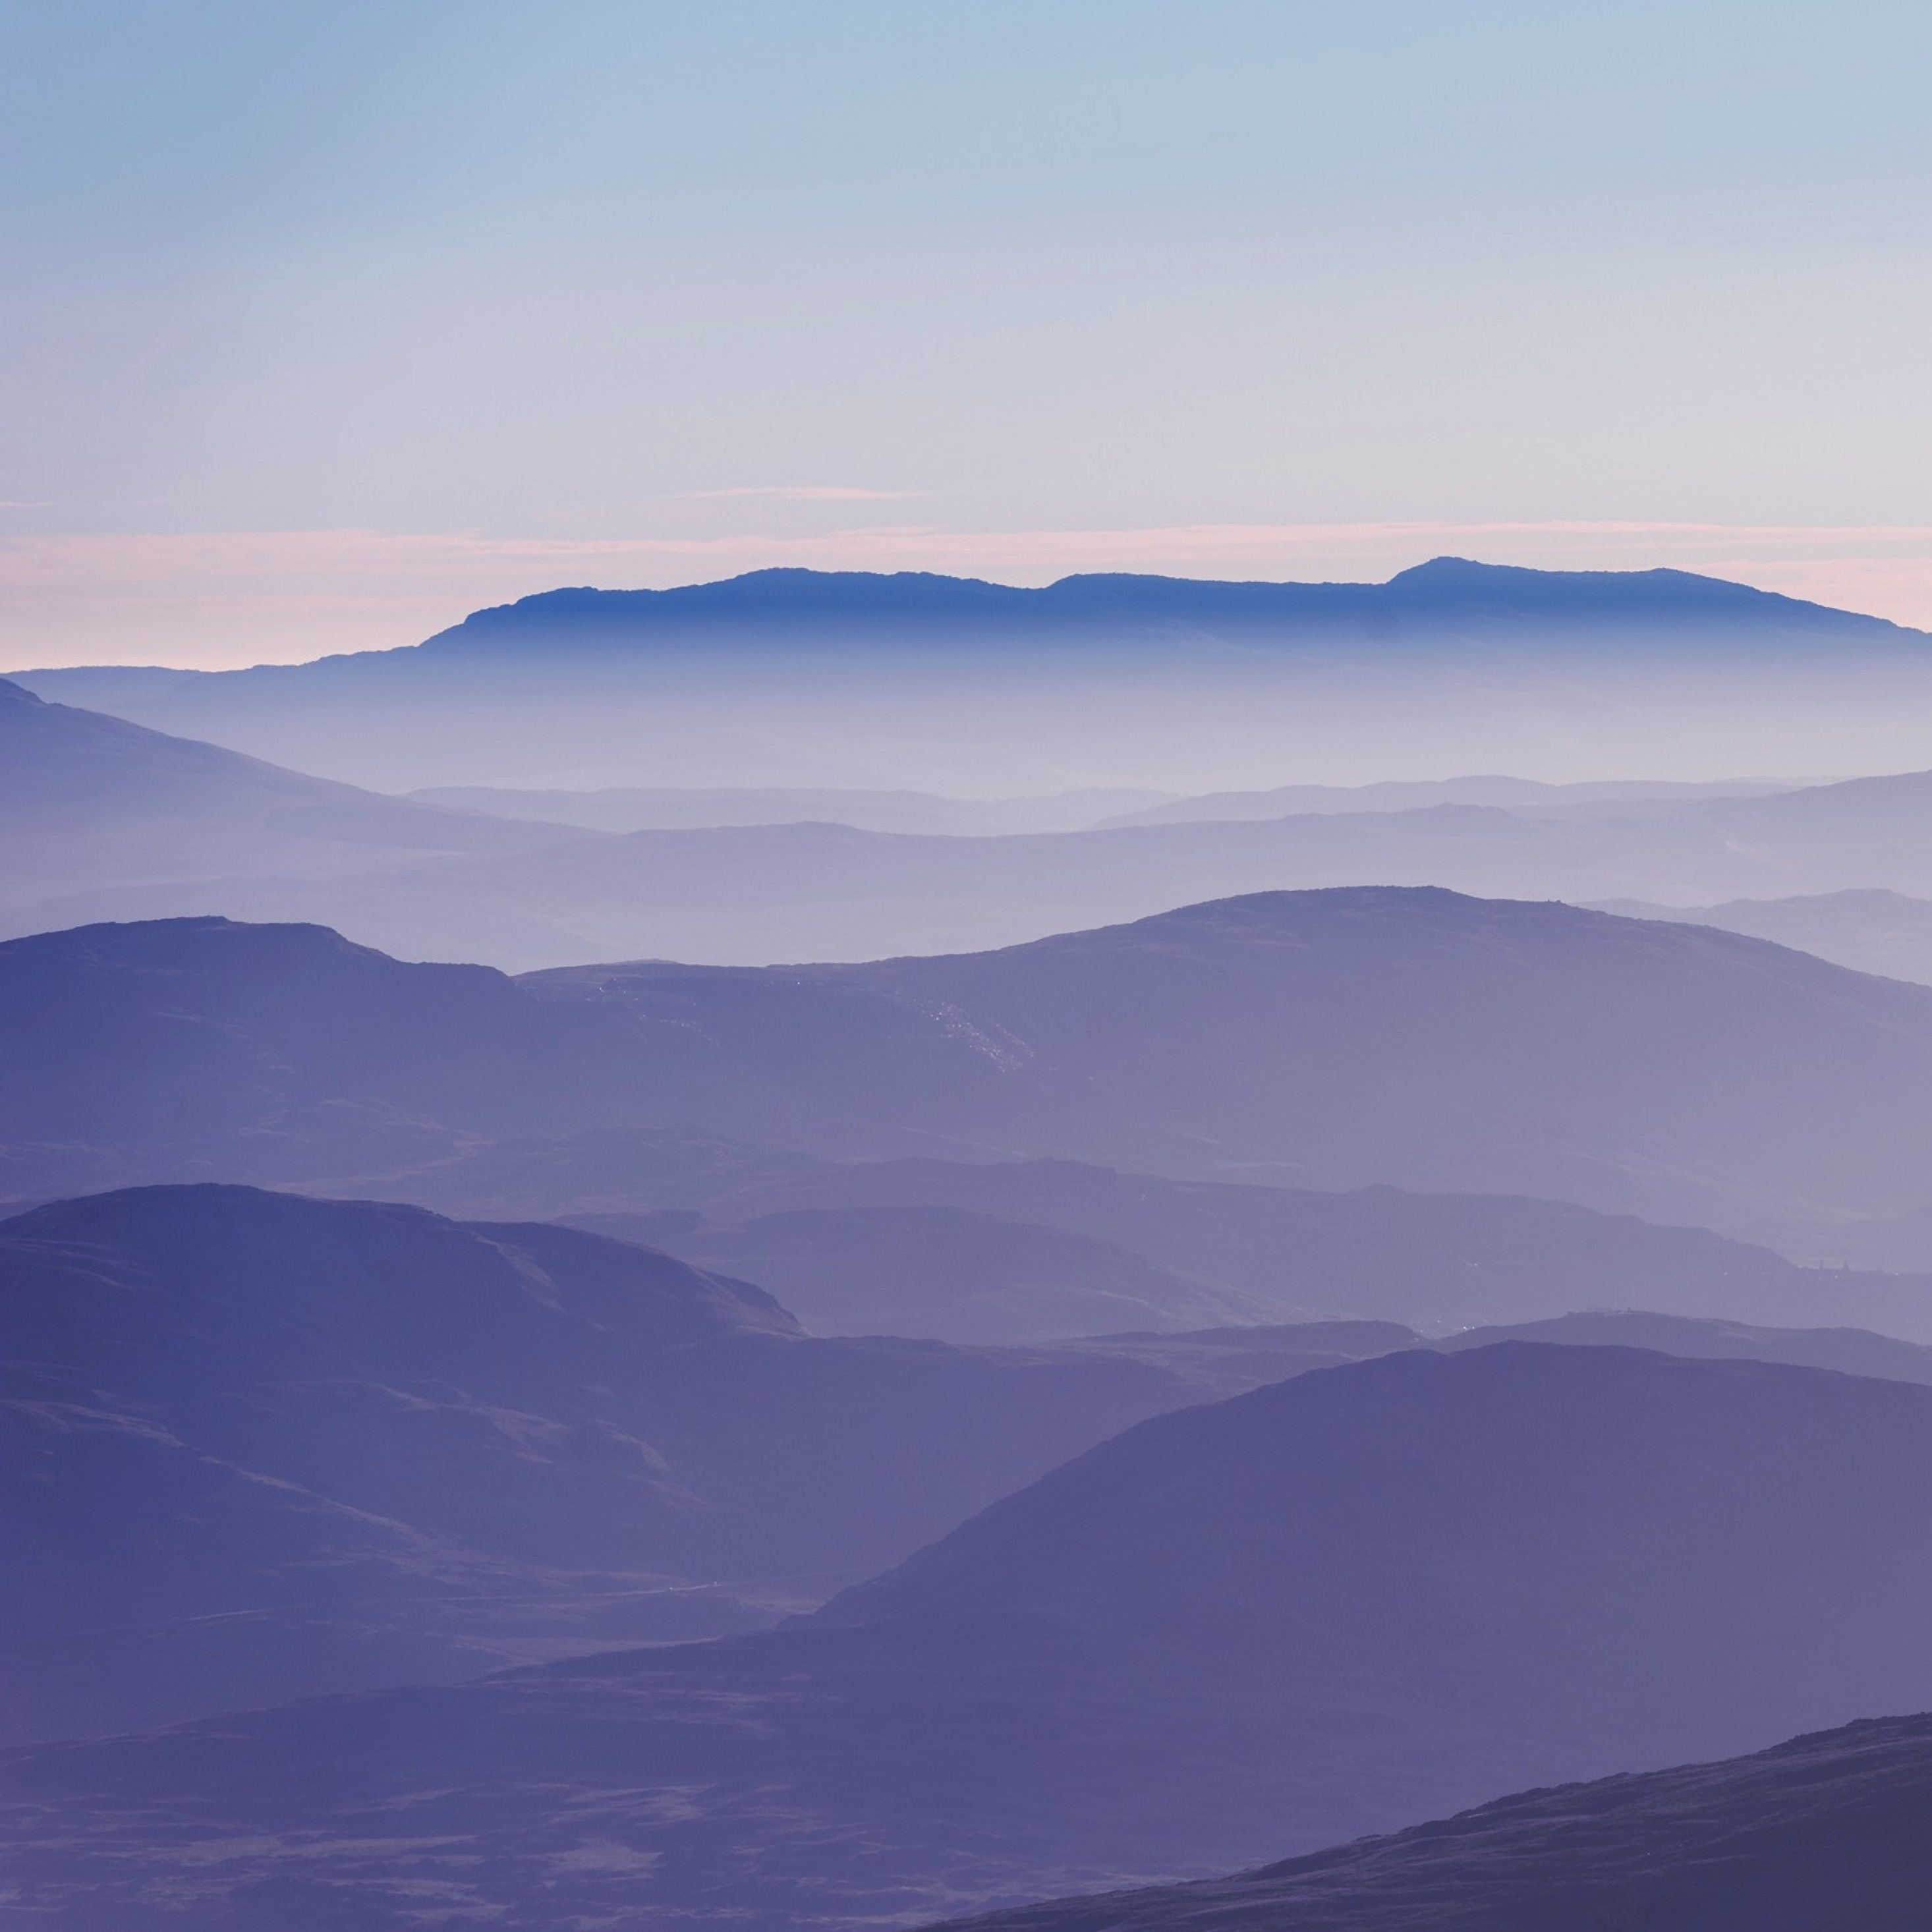 Amazing Wallpaper Mountain Ipad Pro - mountain-layers_61581_2932x2932  Pic_24513.jpg